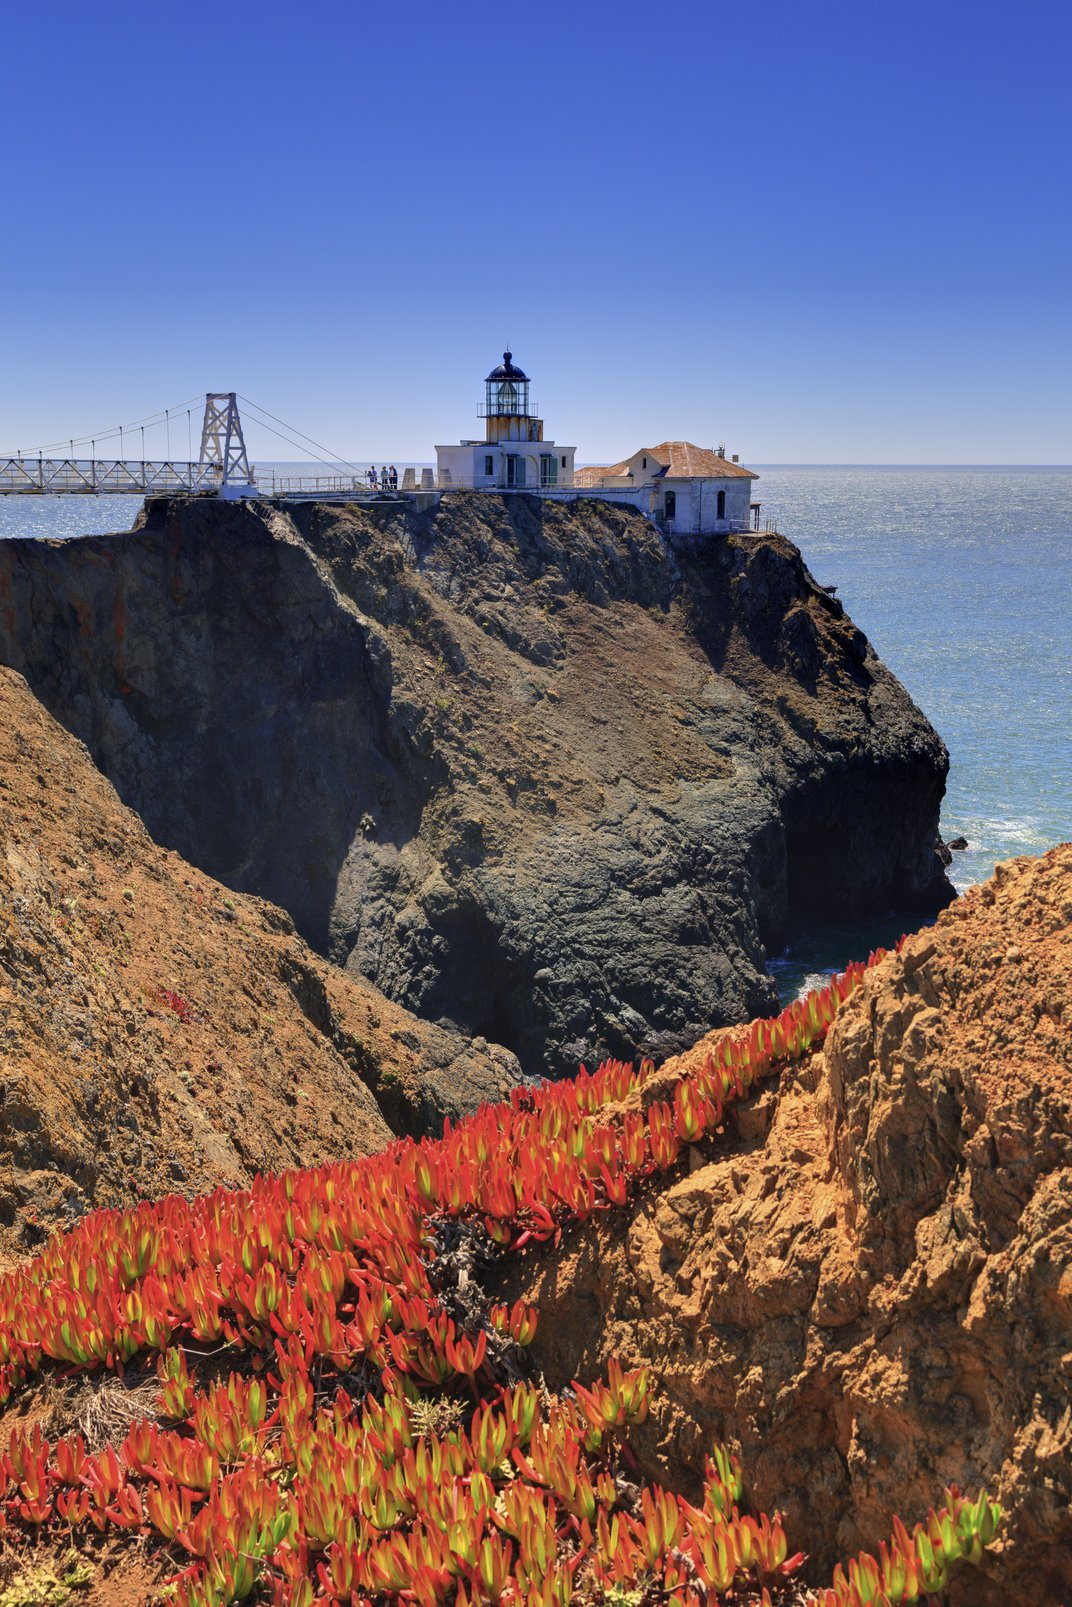 Point Bonita Lighthouse, Golden Gate National Recreation Area, Marin County, CA. (Richard Cummins/Corbis)